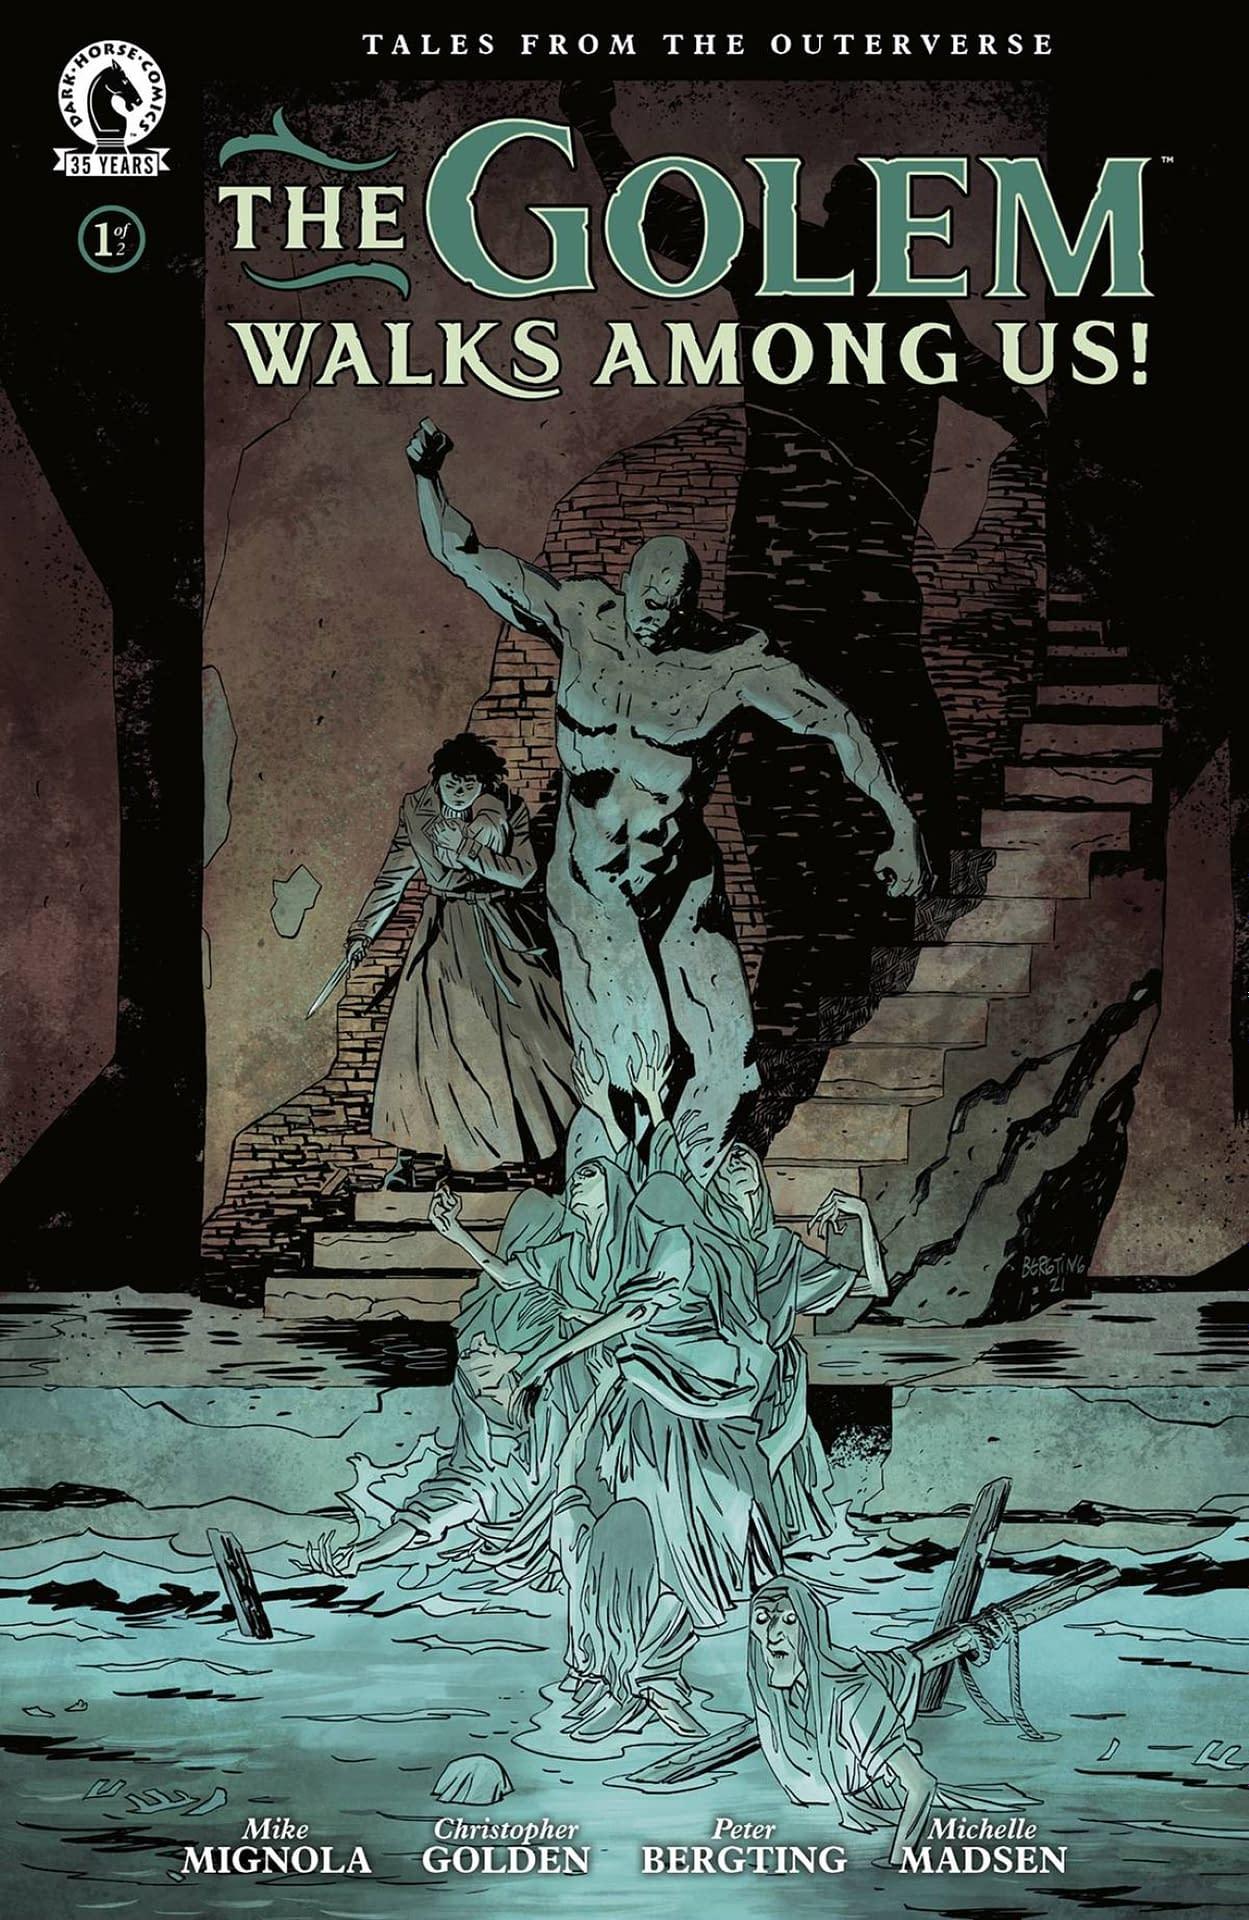 GOLEM WALKS AMONG US #1 (OF 2) CVR A BERGTING